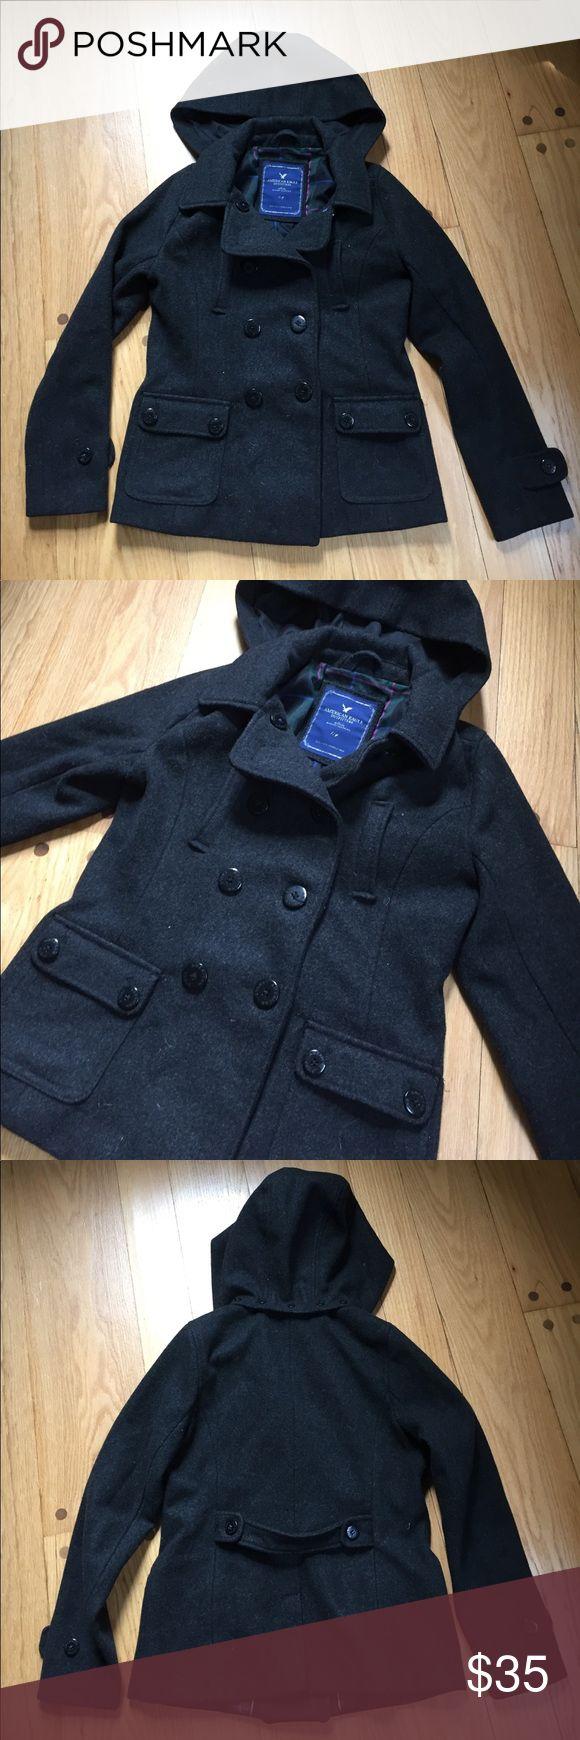 American Eagle woman's dark grey pea coat size L American Eagle dark grey pea coat size L. Good condition!! American Eagle Outfitters Jackets & Coats Pea Coats